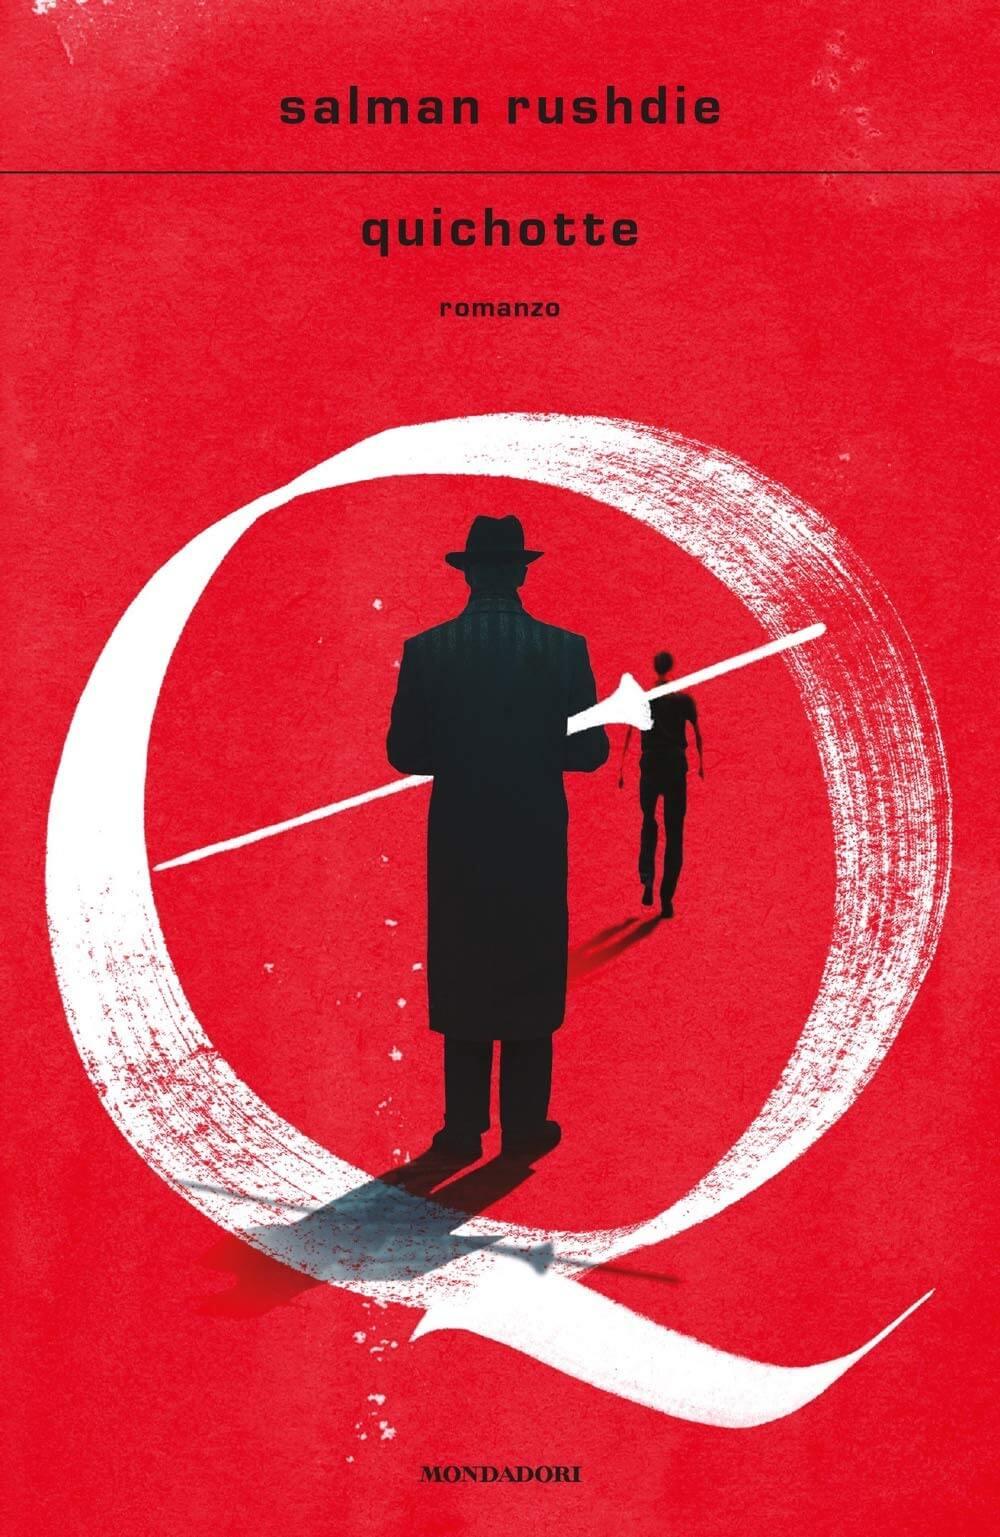 Quichotte - Salman Rushdie maggio 2020